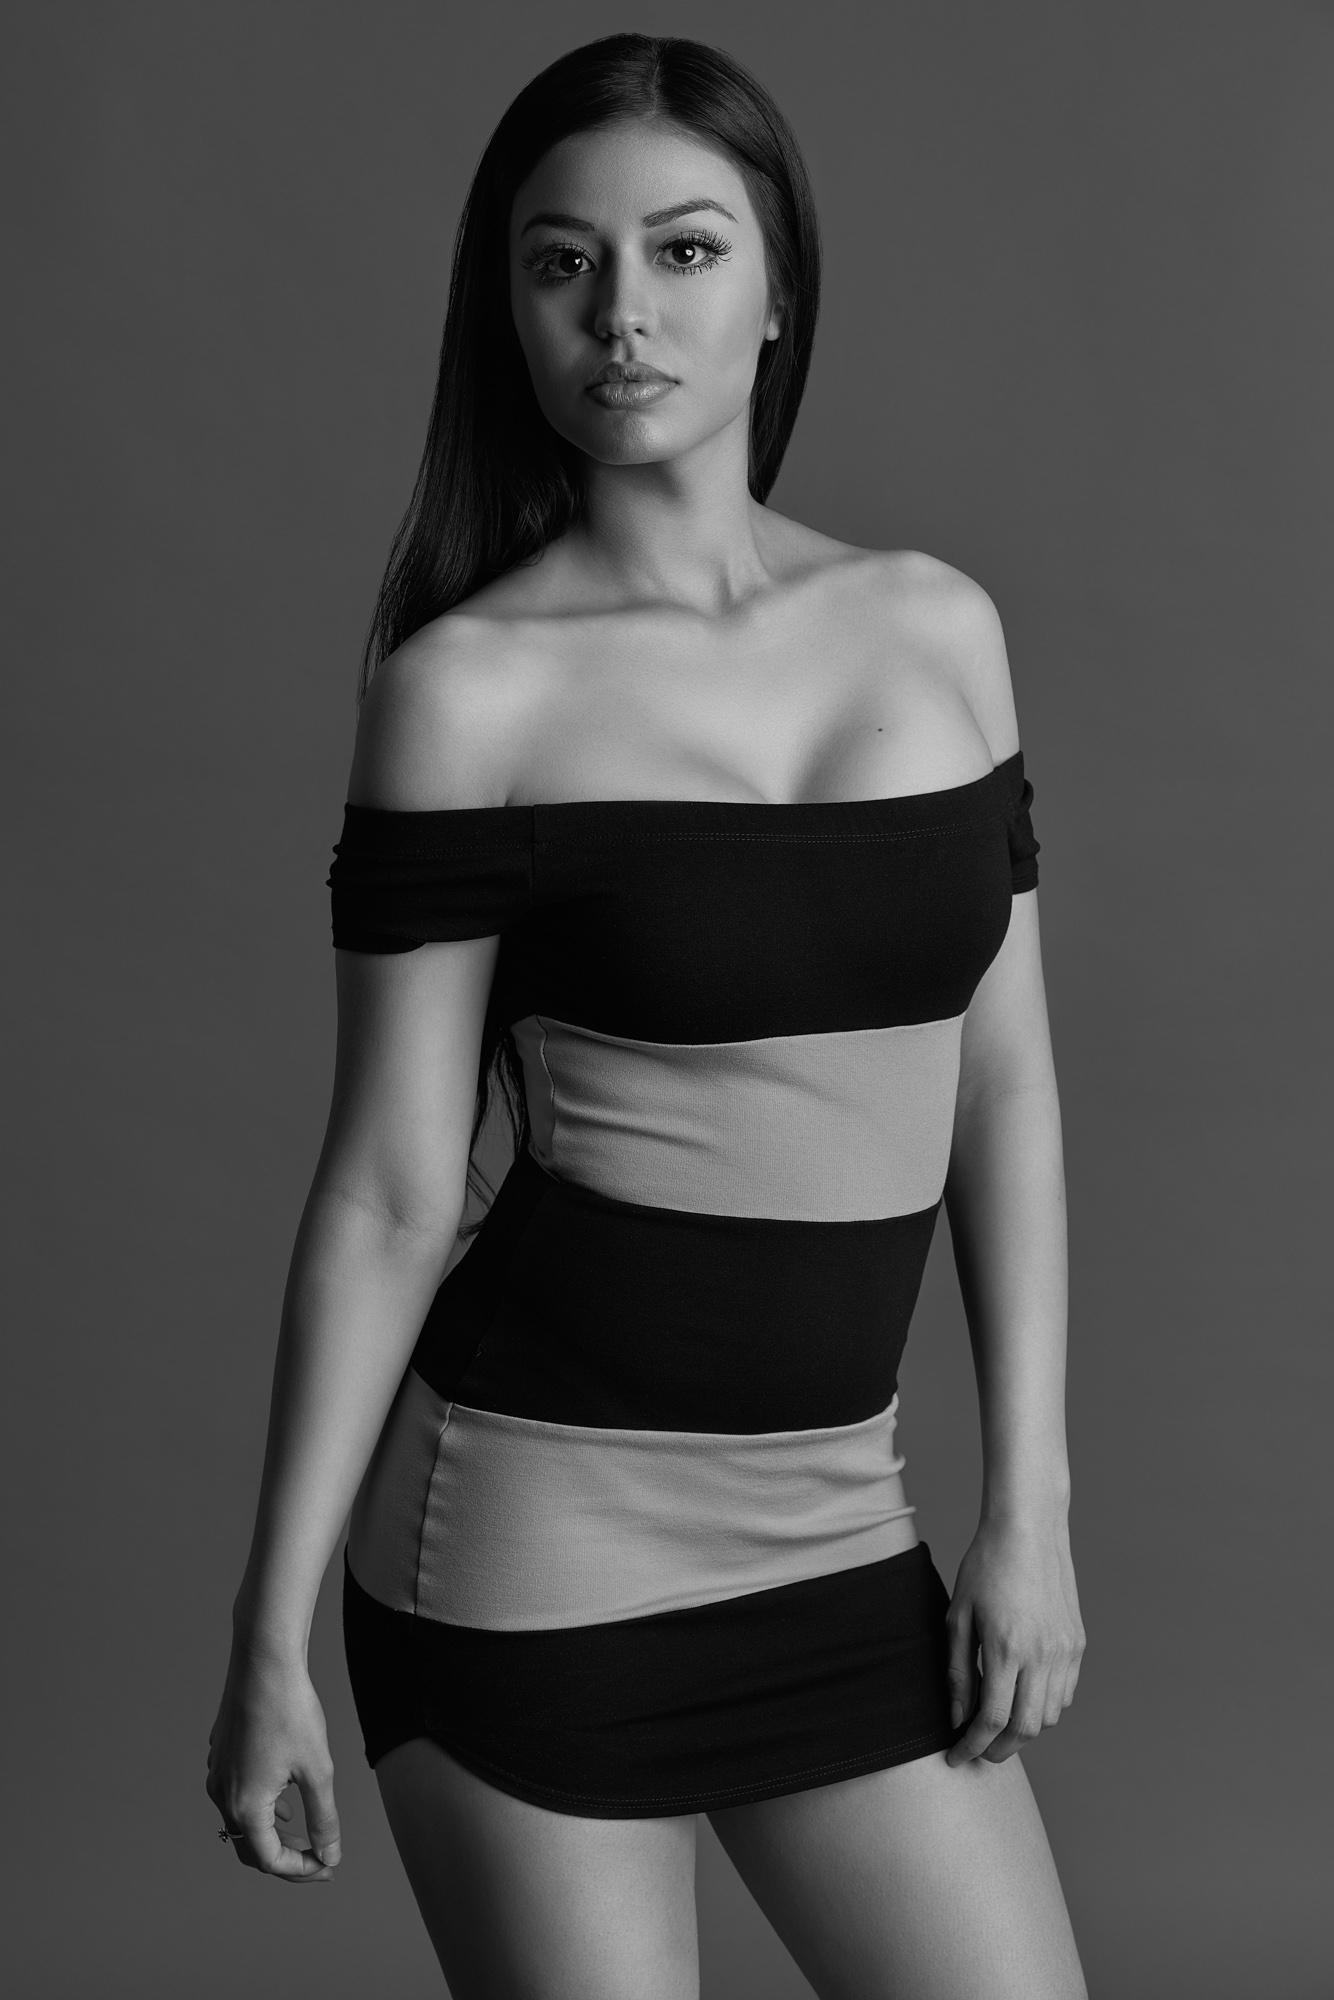 Veronica Fashion Model by Mesa Arizona Fashion Portrait Photographer Chad Weed